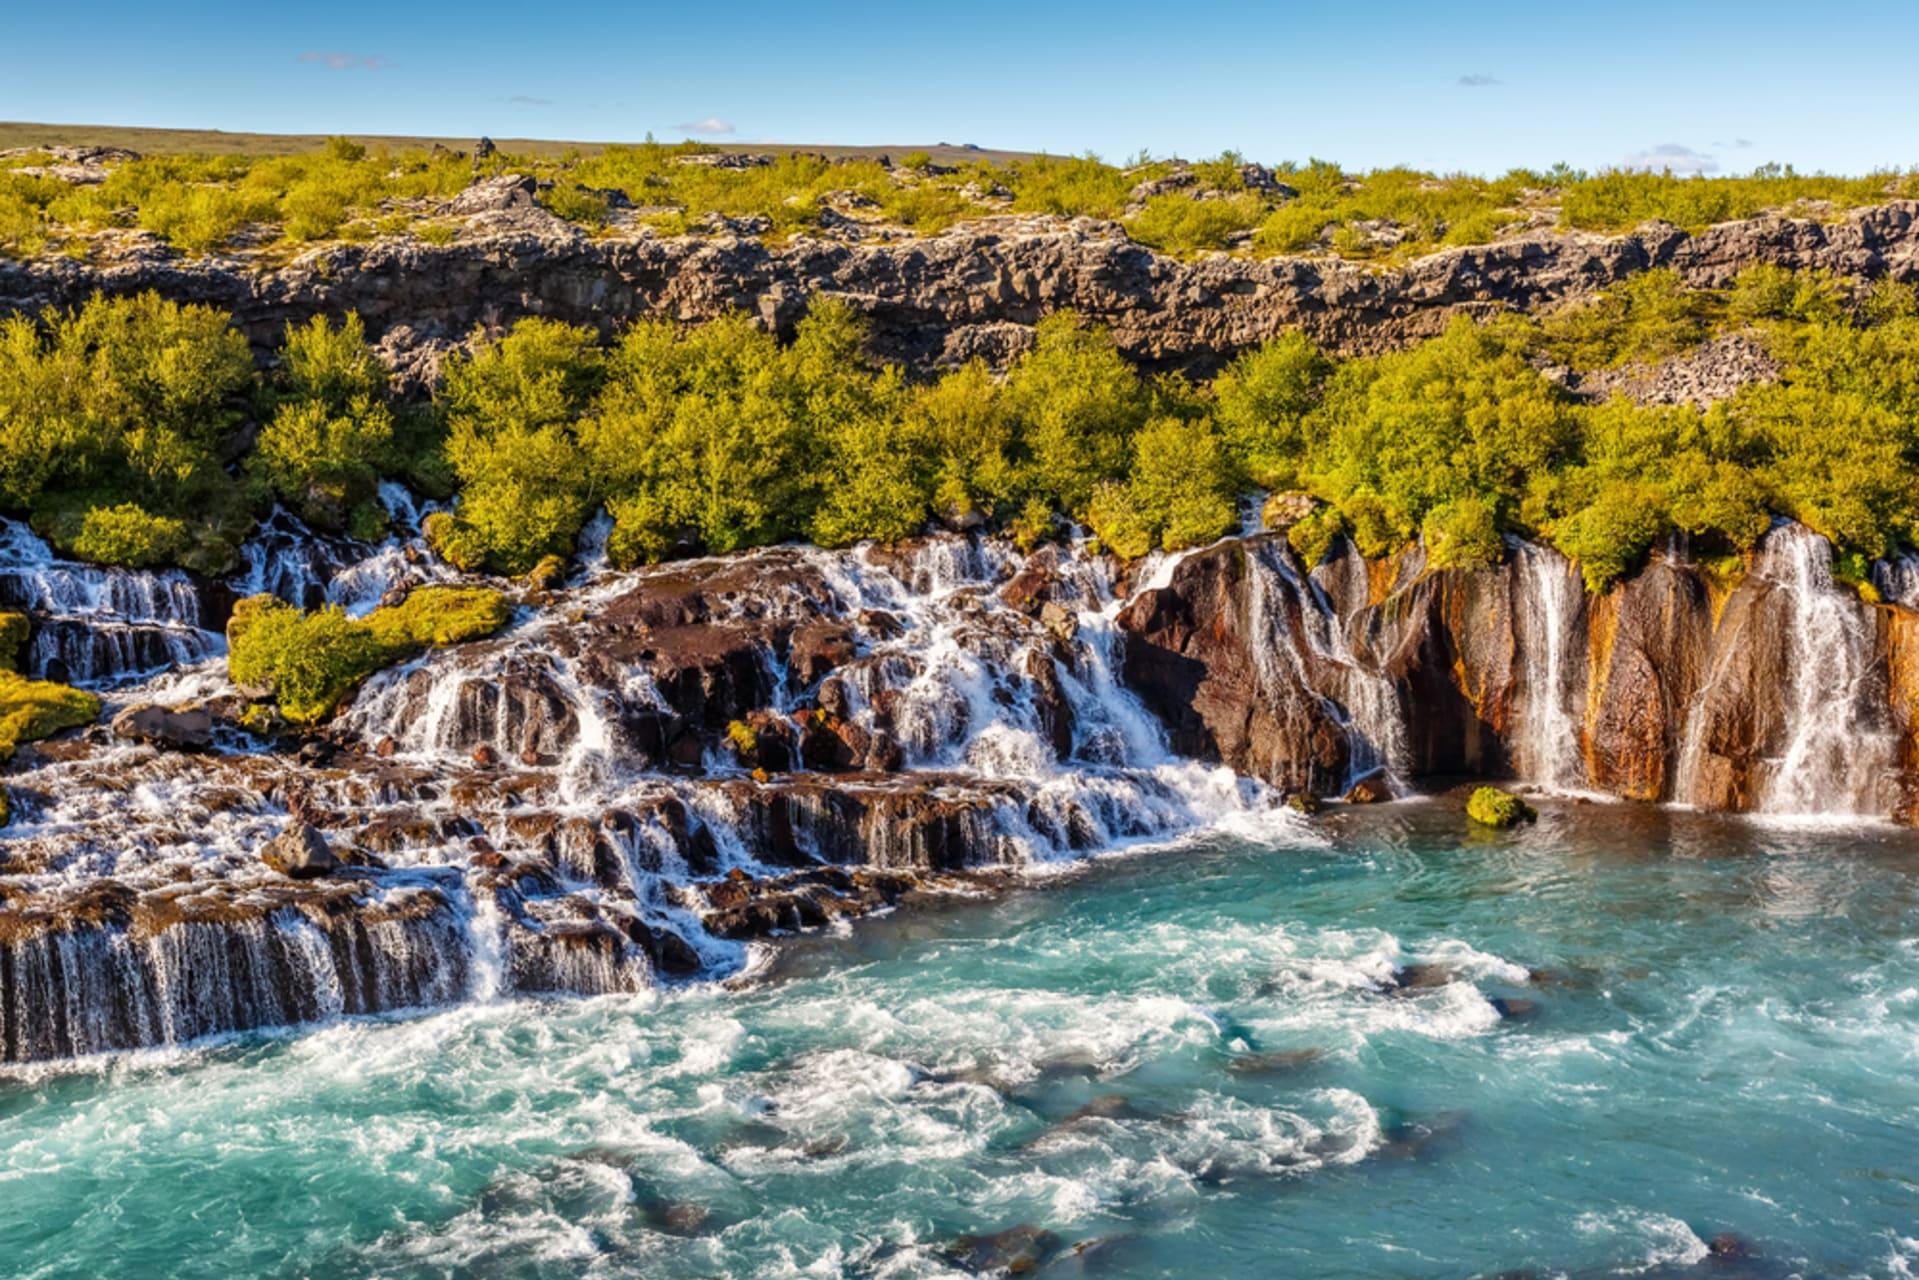 West Iceland - Hraunfossar - Lavafields and Waterfalls